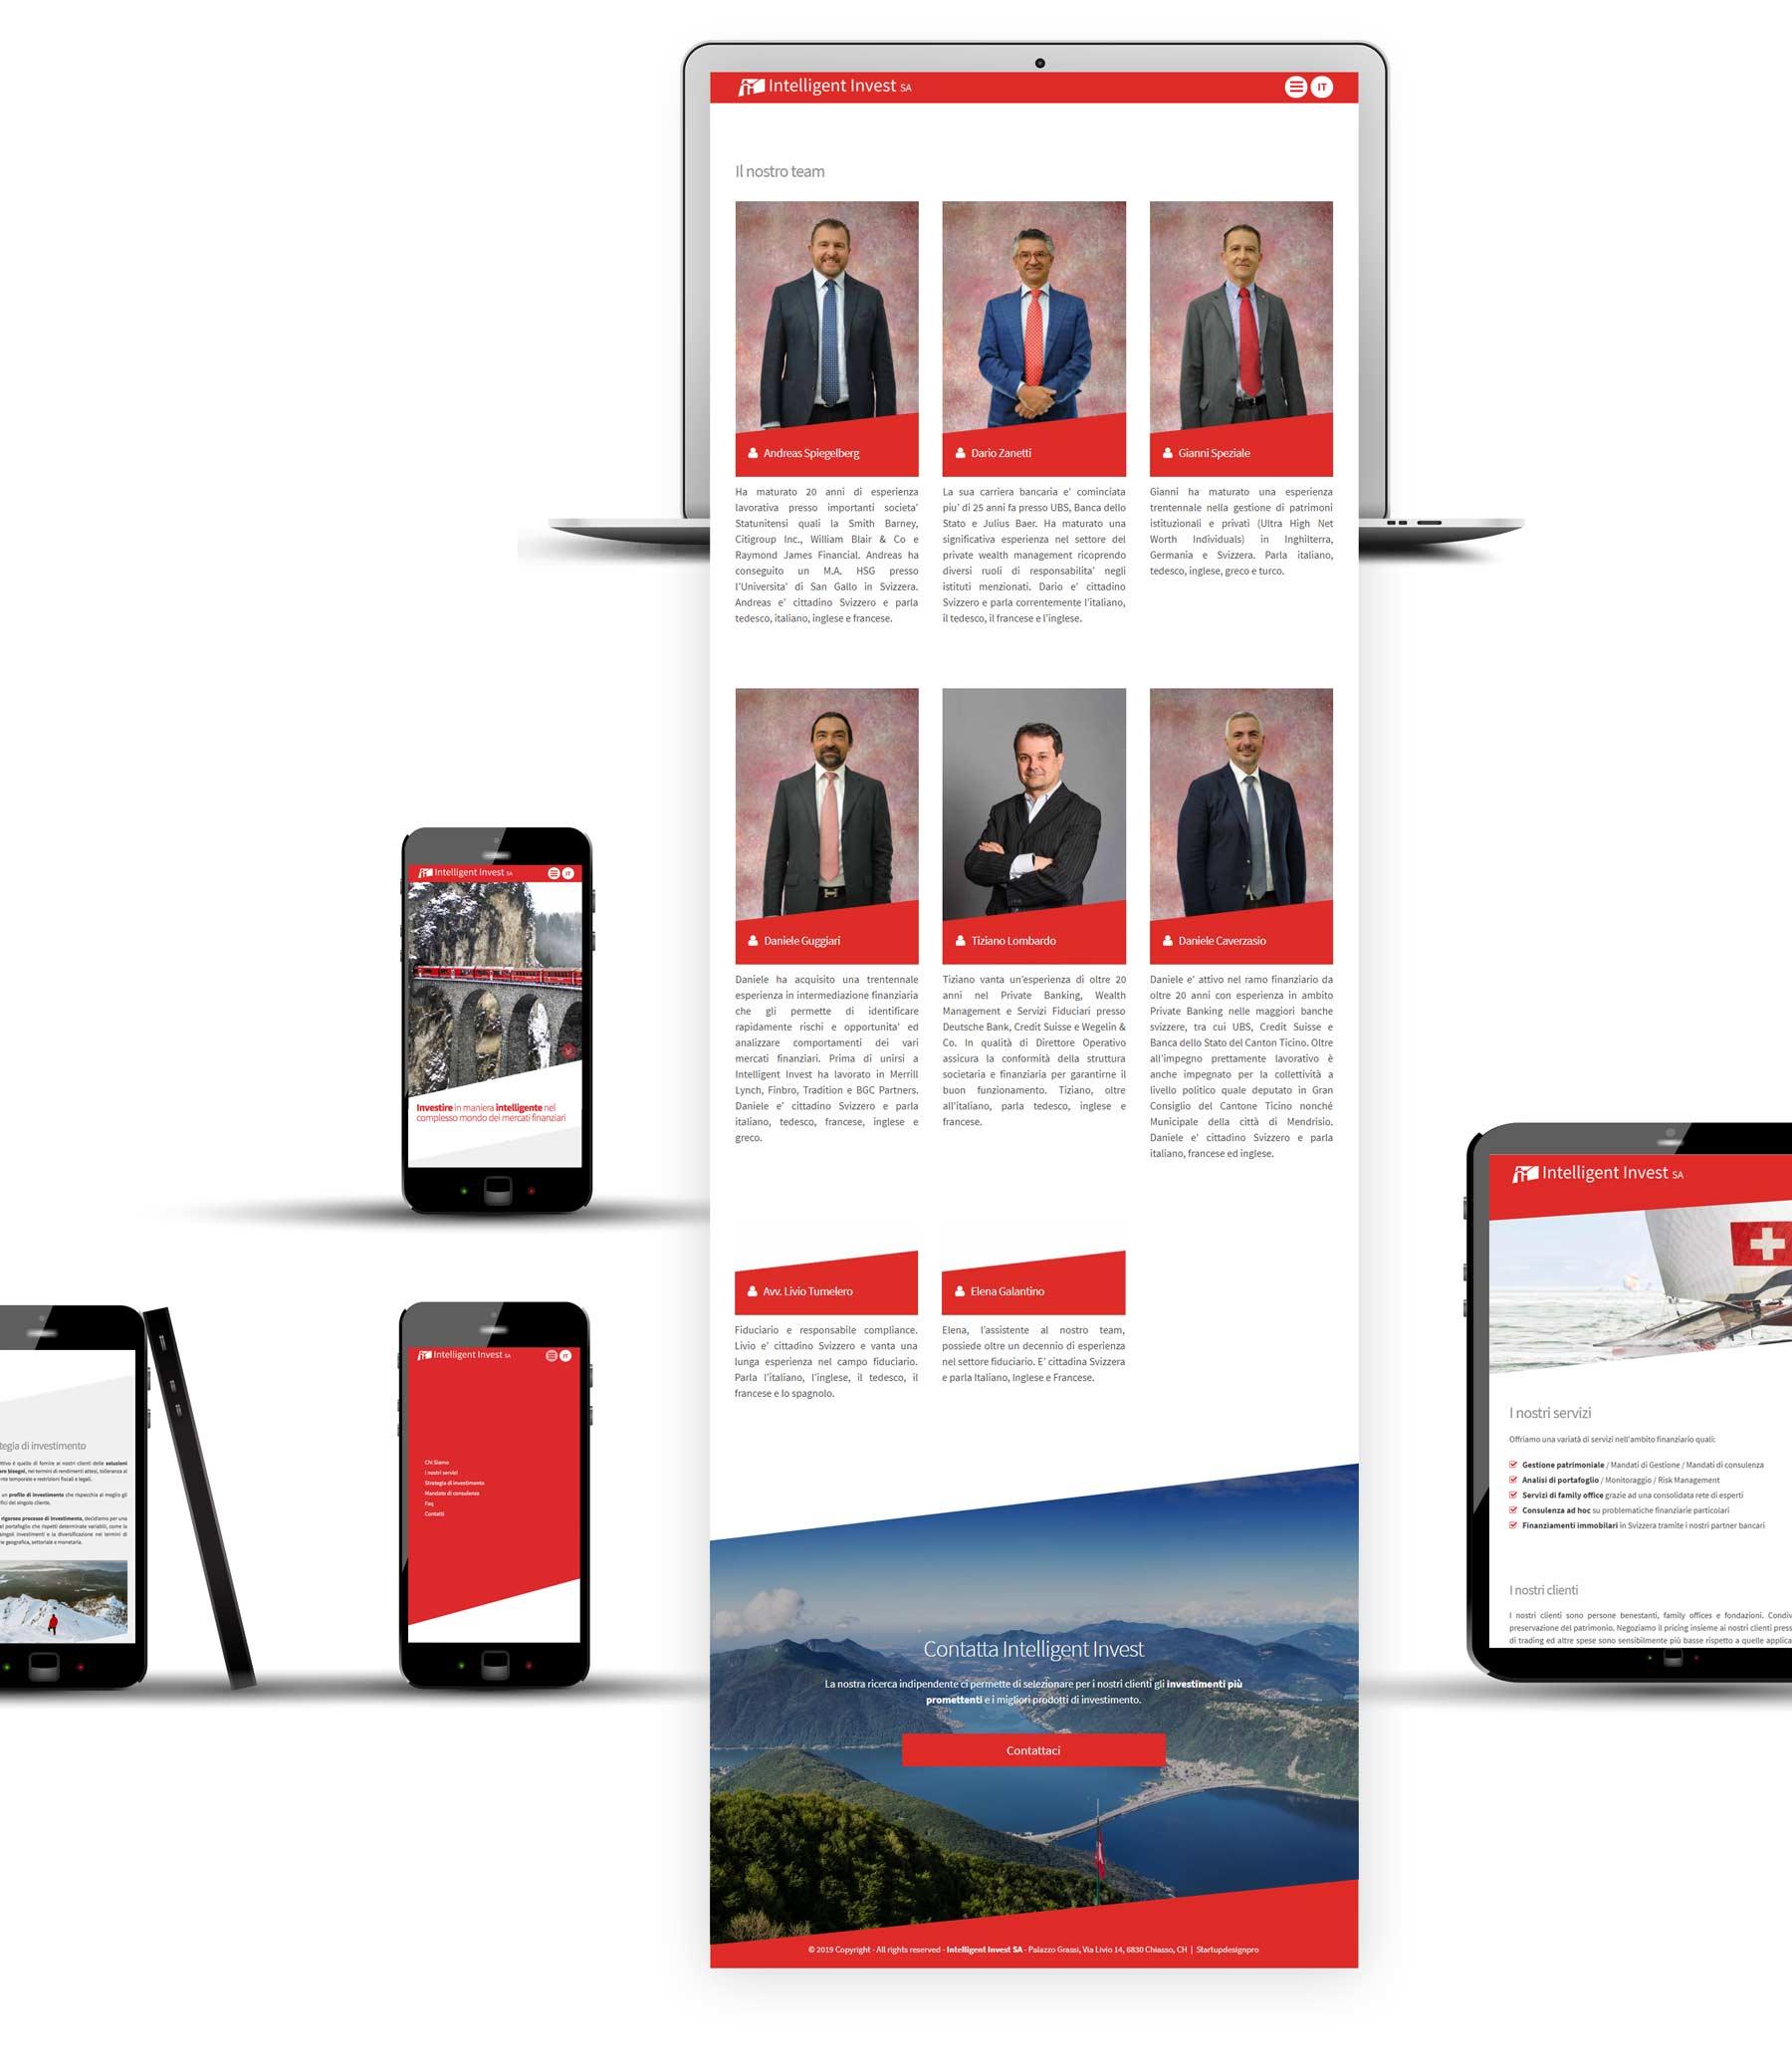 corporate identity startupdesignpro intelligent invest